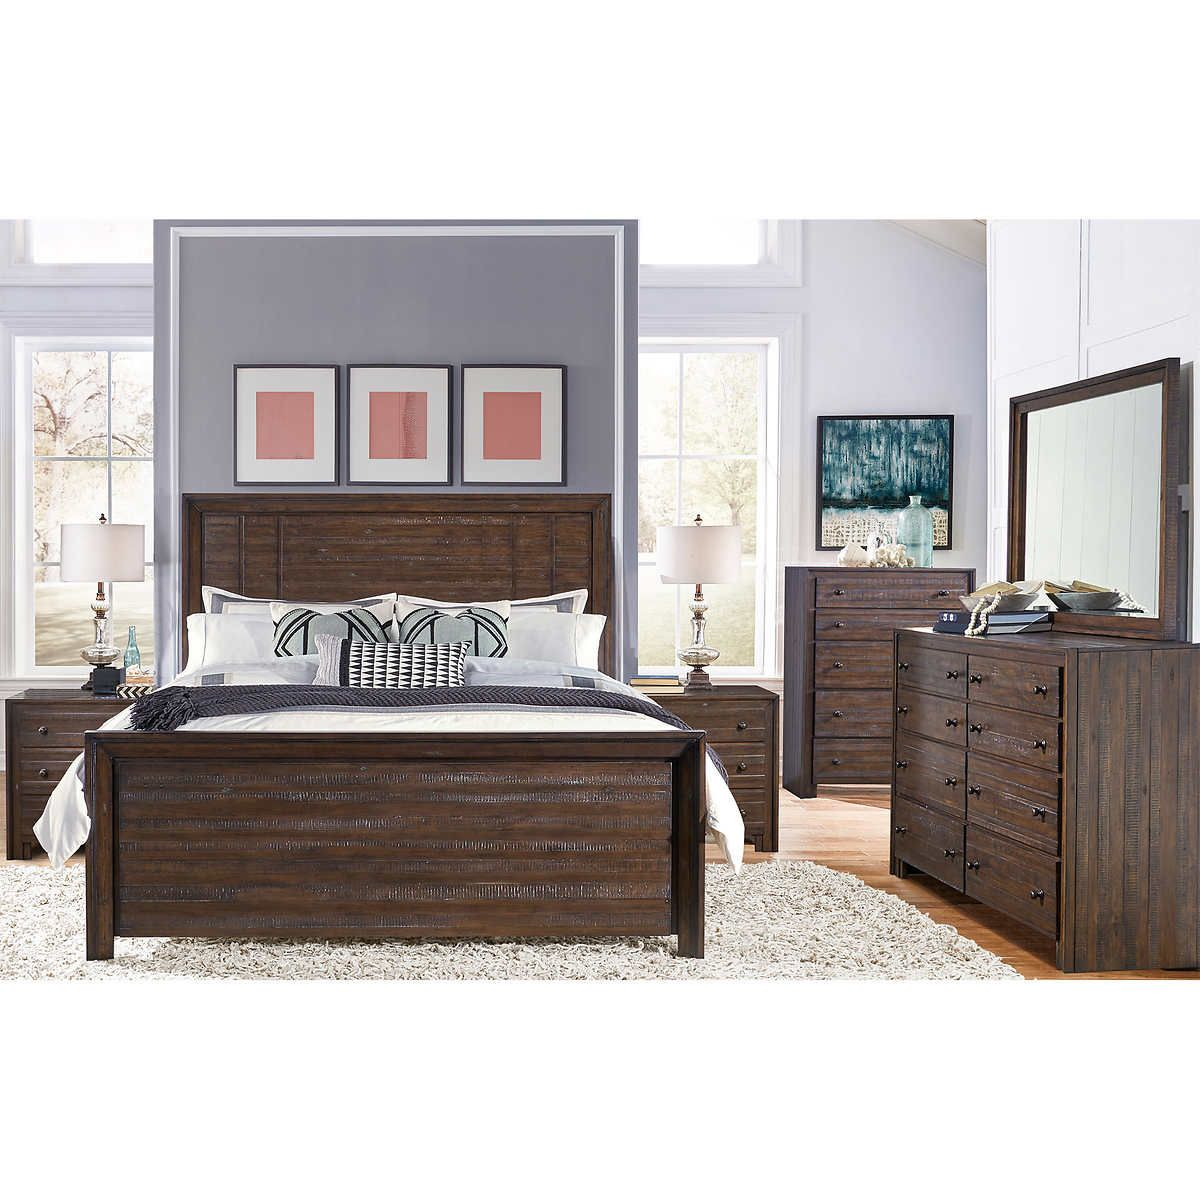 Pin by Milepost 24 on Pleasanton King bedroom sets